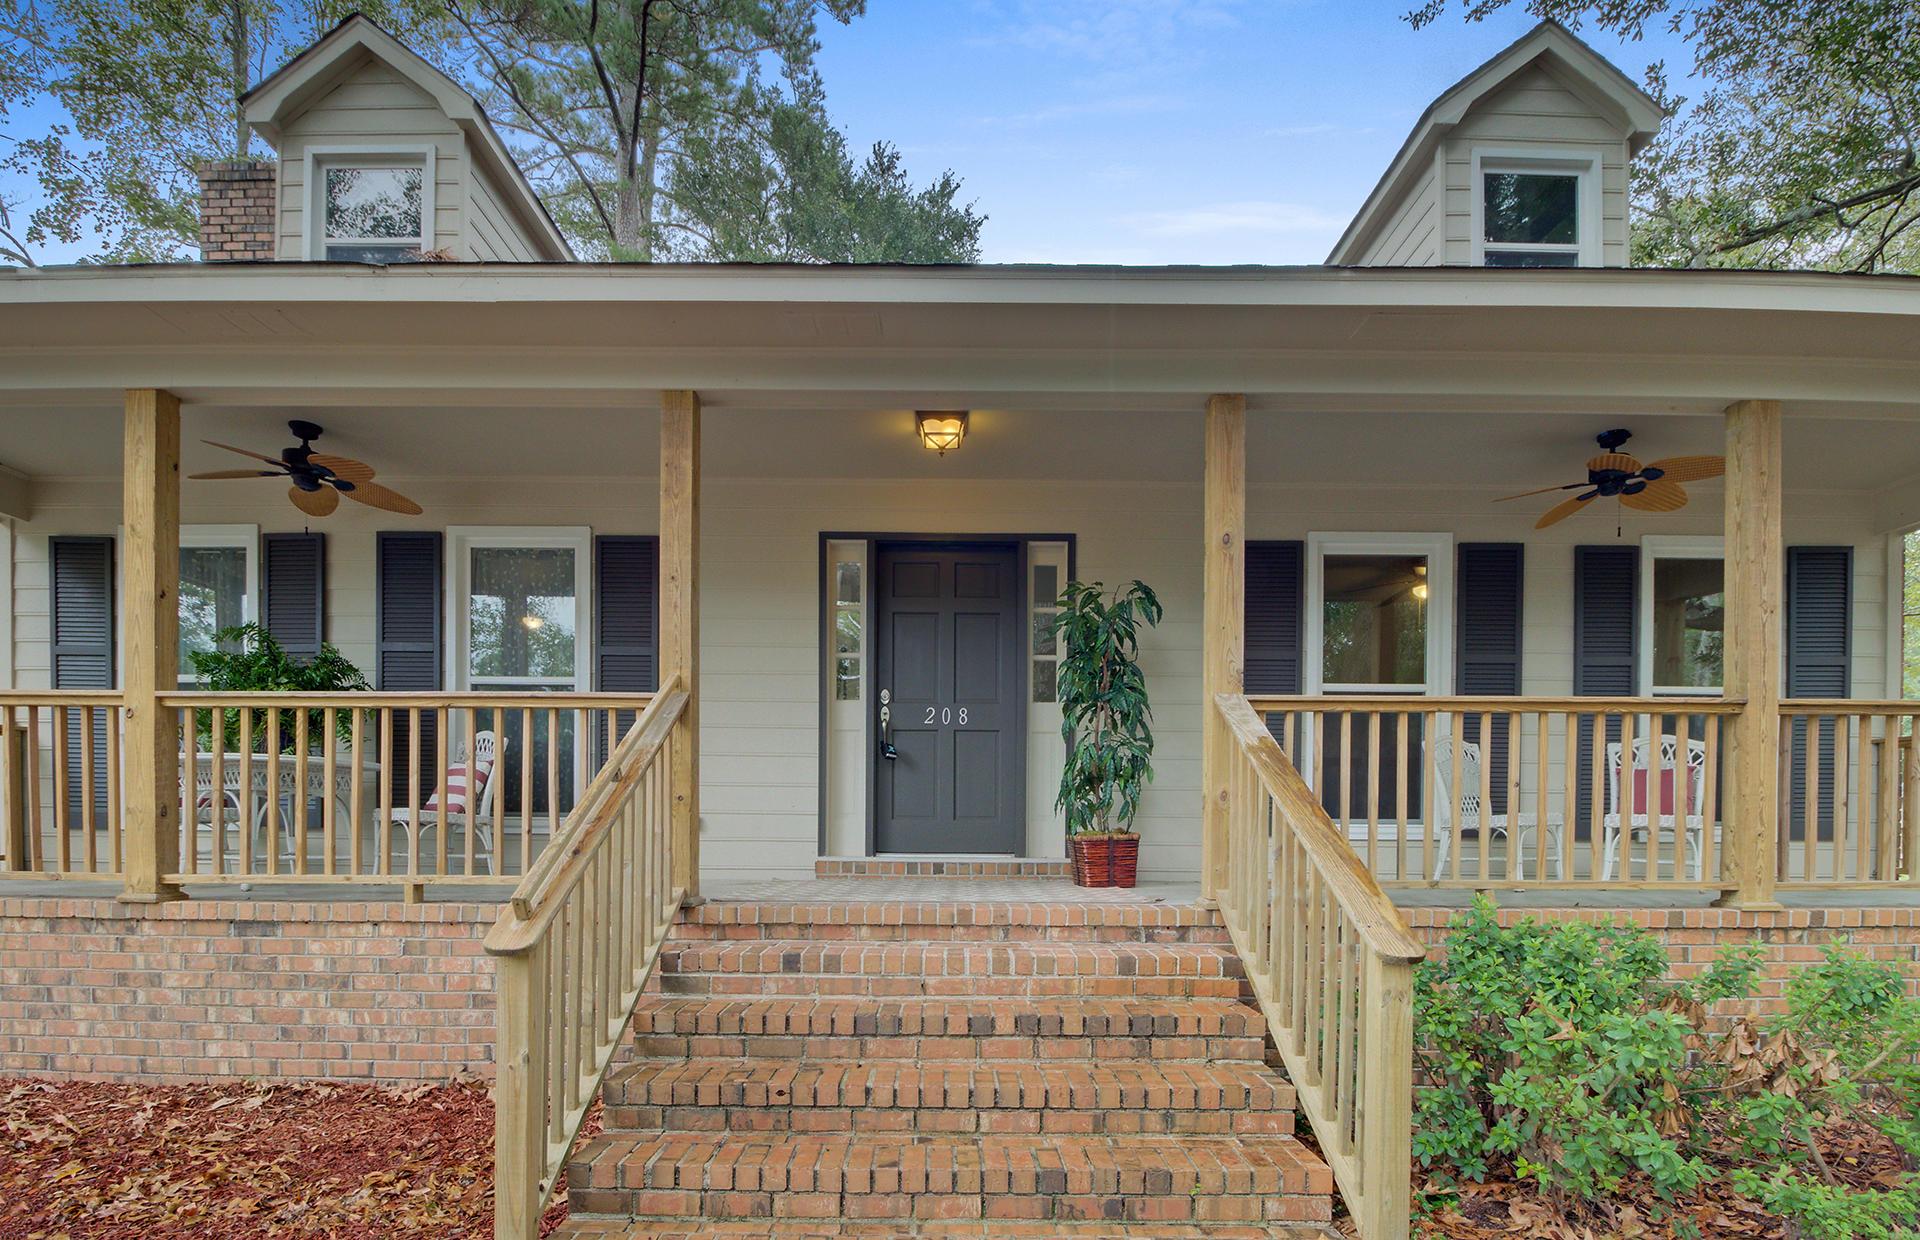 White Church Place Homes For Sale - 208 Glebe, Summerville, SC - 5